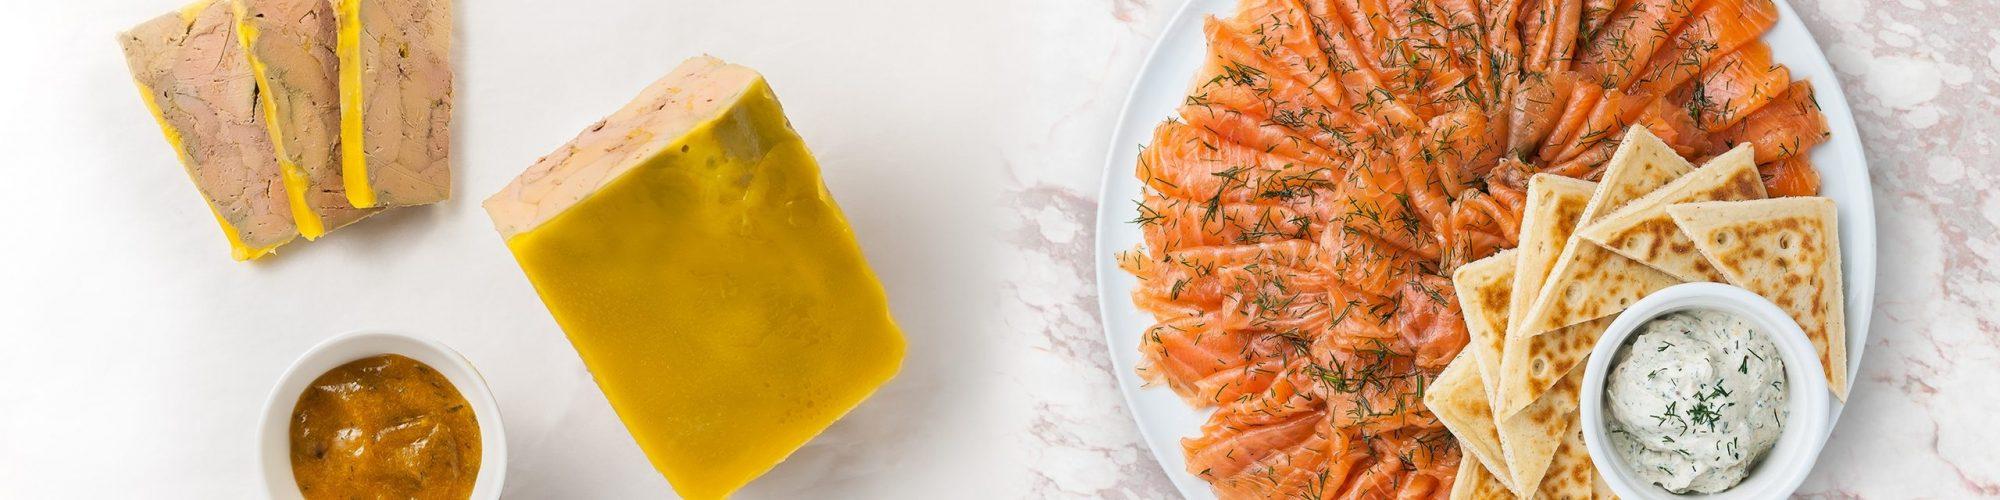 Carte noel foie gras saumon_2.1.1